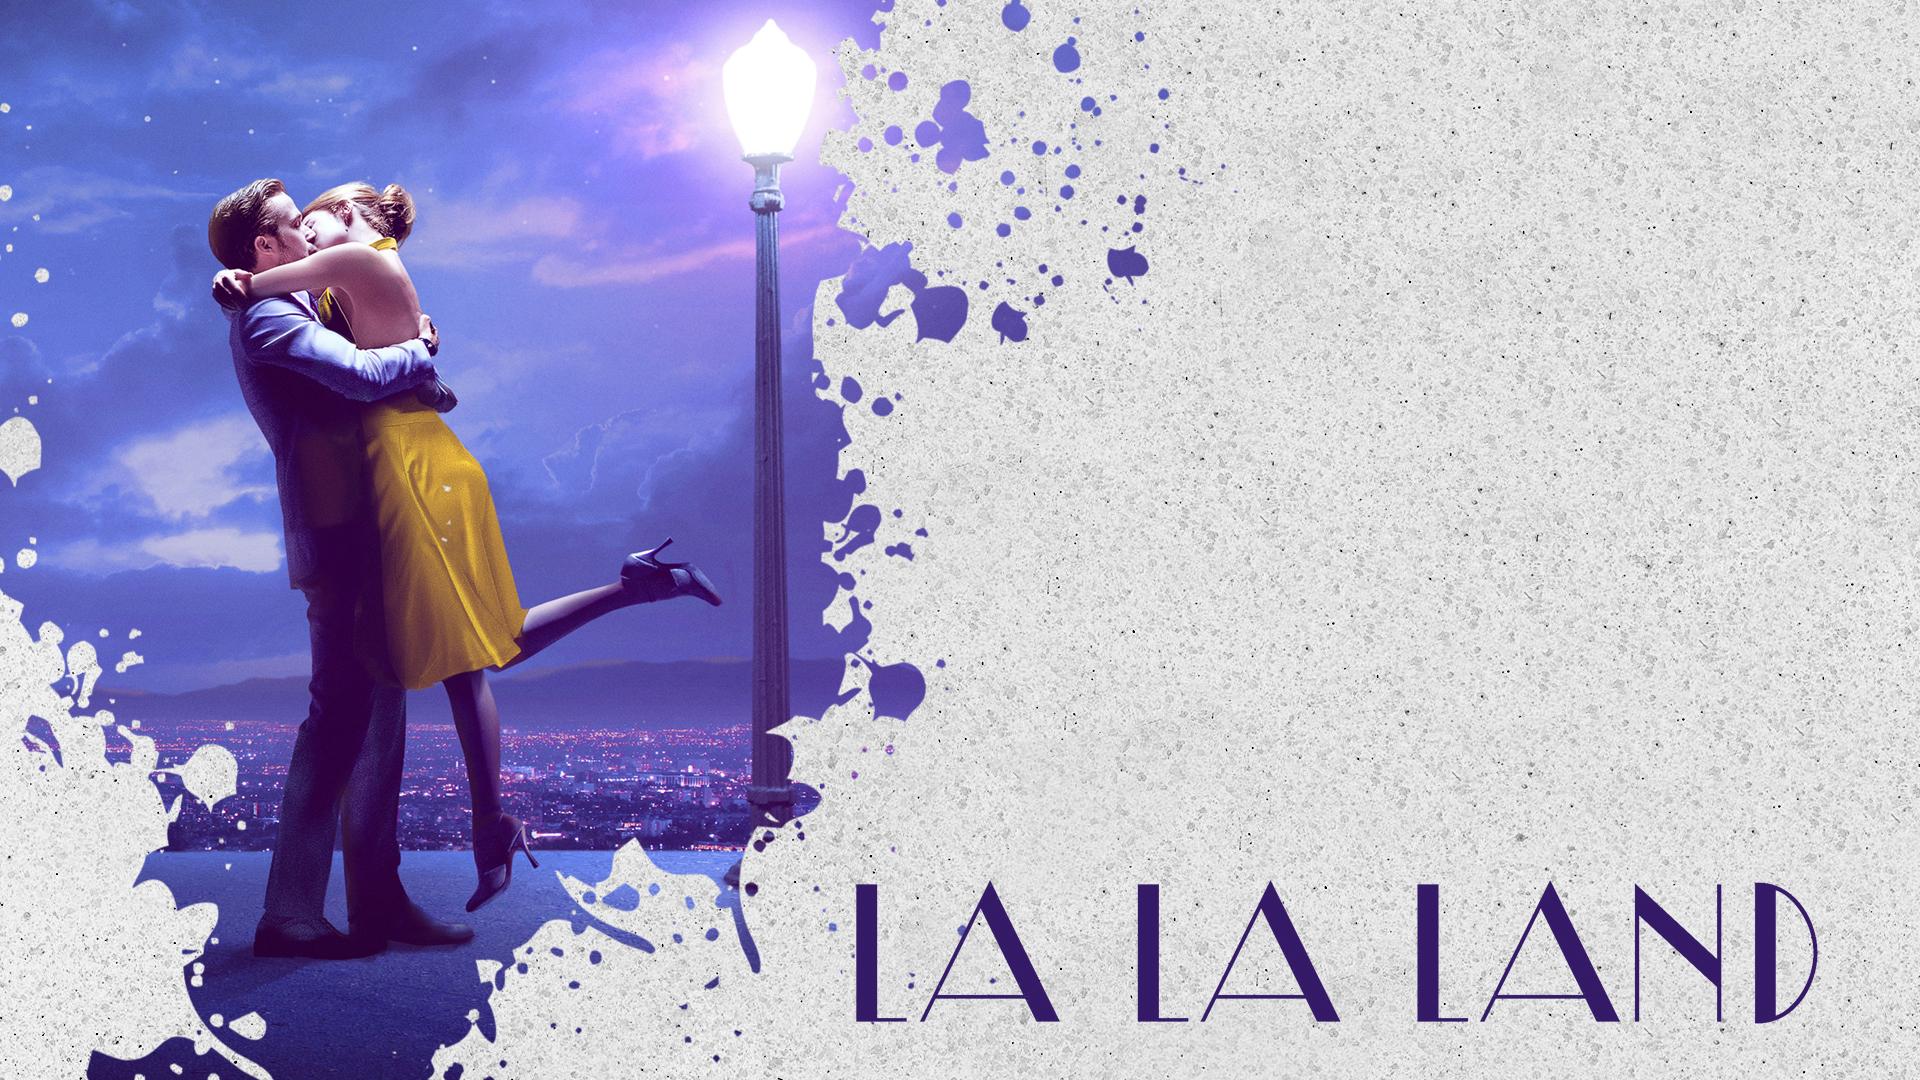 lala land online